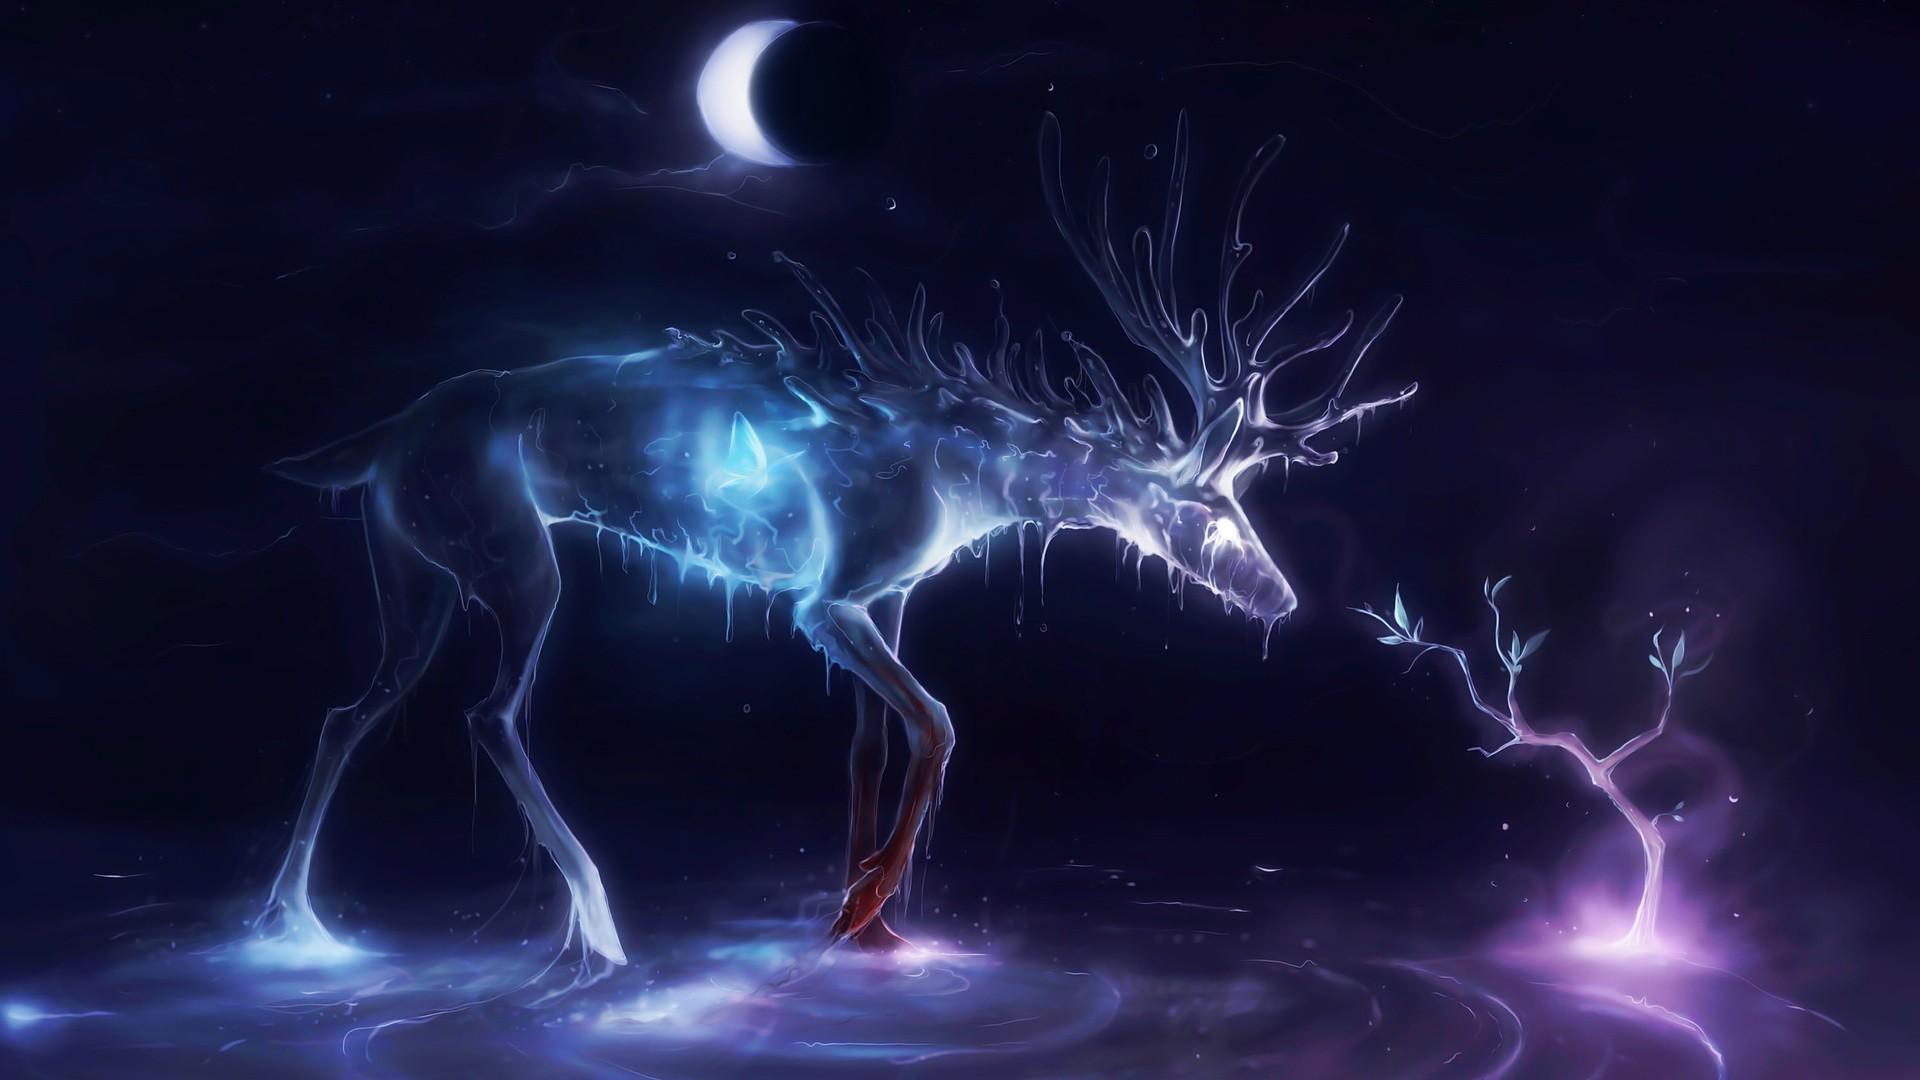 General 1920x1080 deer crescent moon glowing animals artwork night ripples antlers